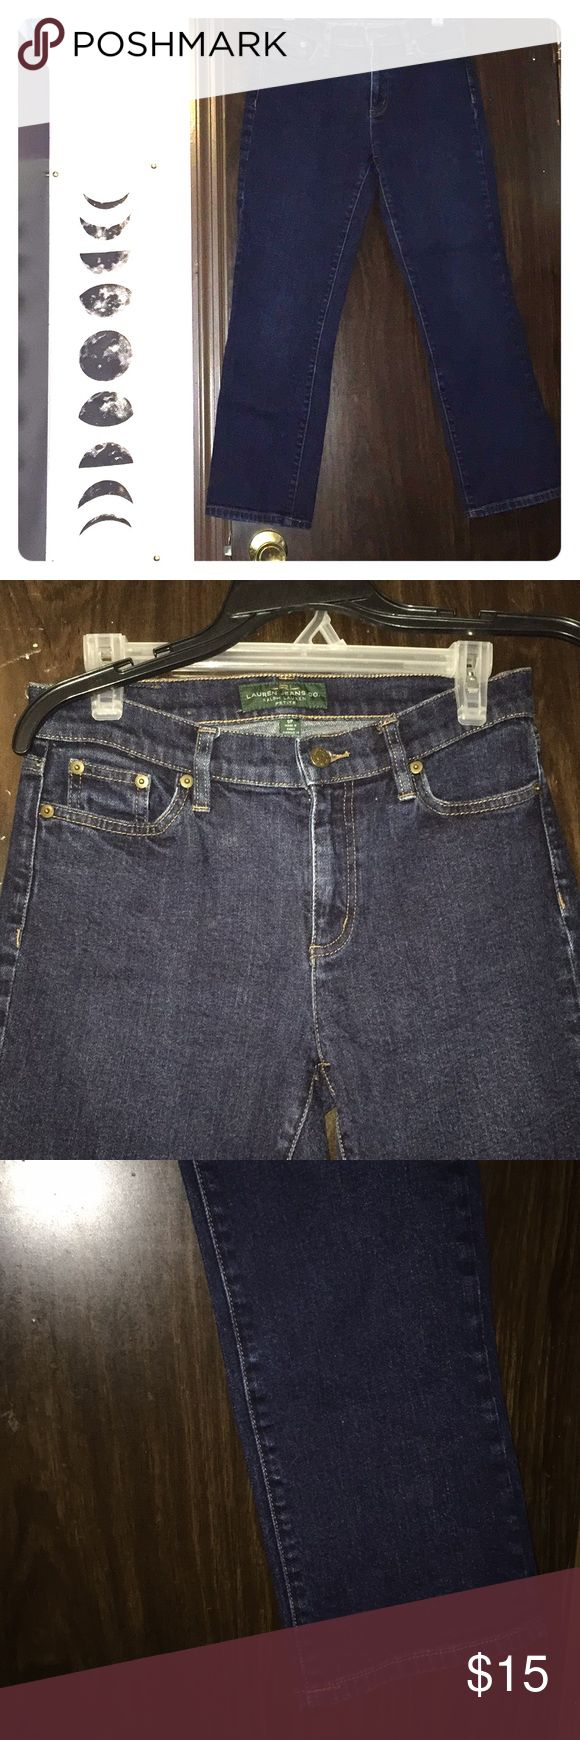 Ralph lauren jeans size petite housewife photos porn